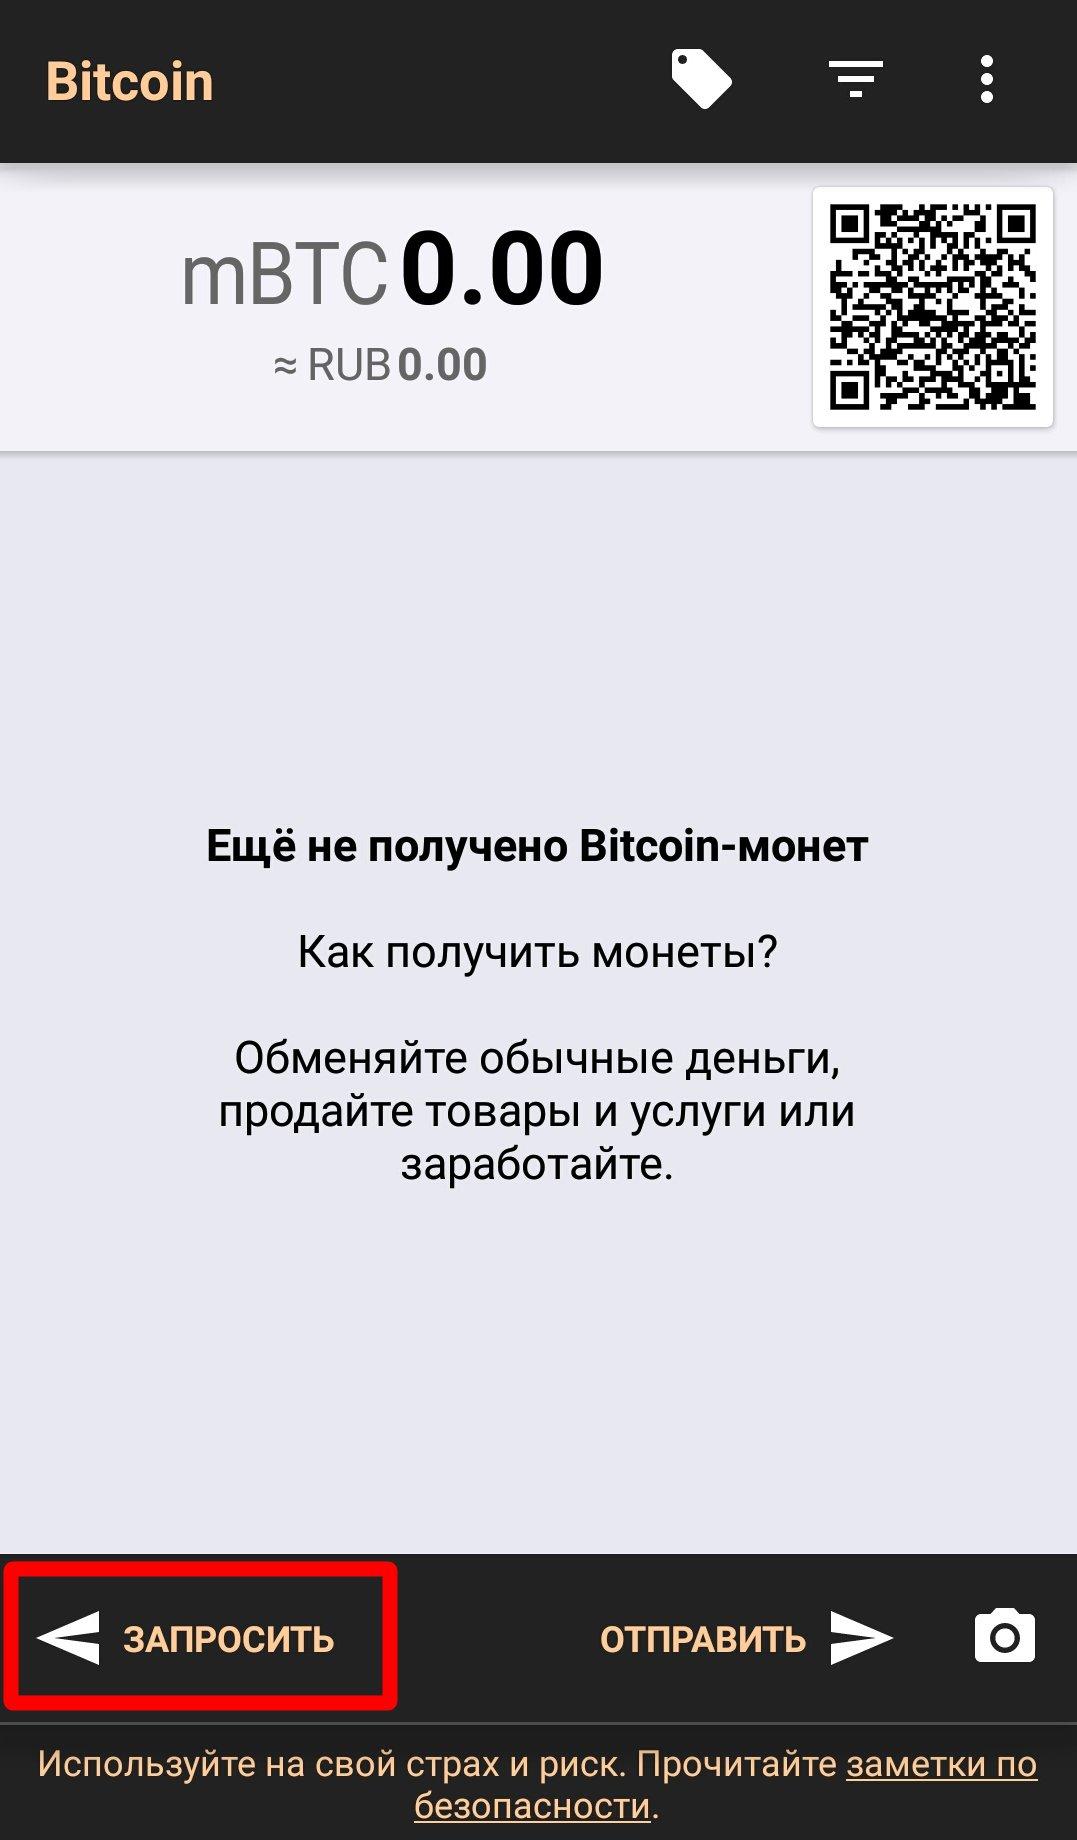 биткоина рублю за неделю к курс-14